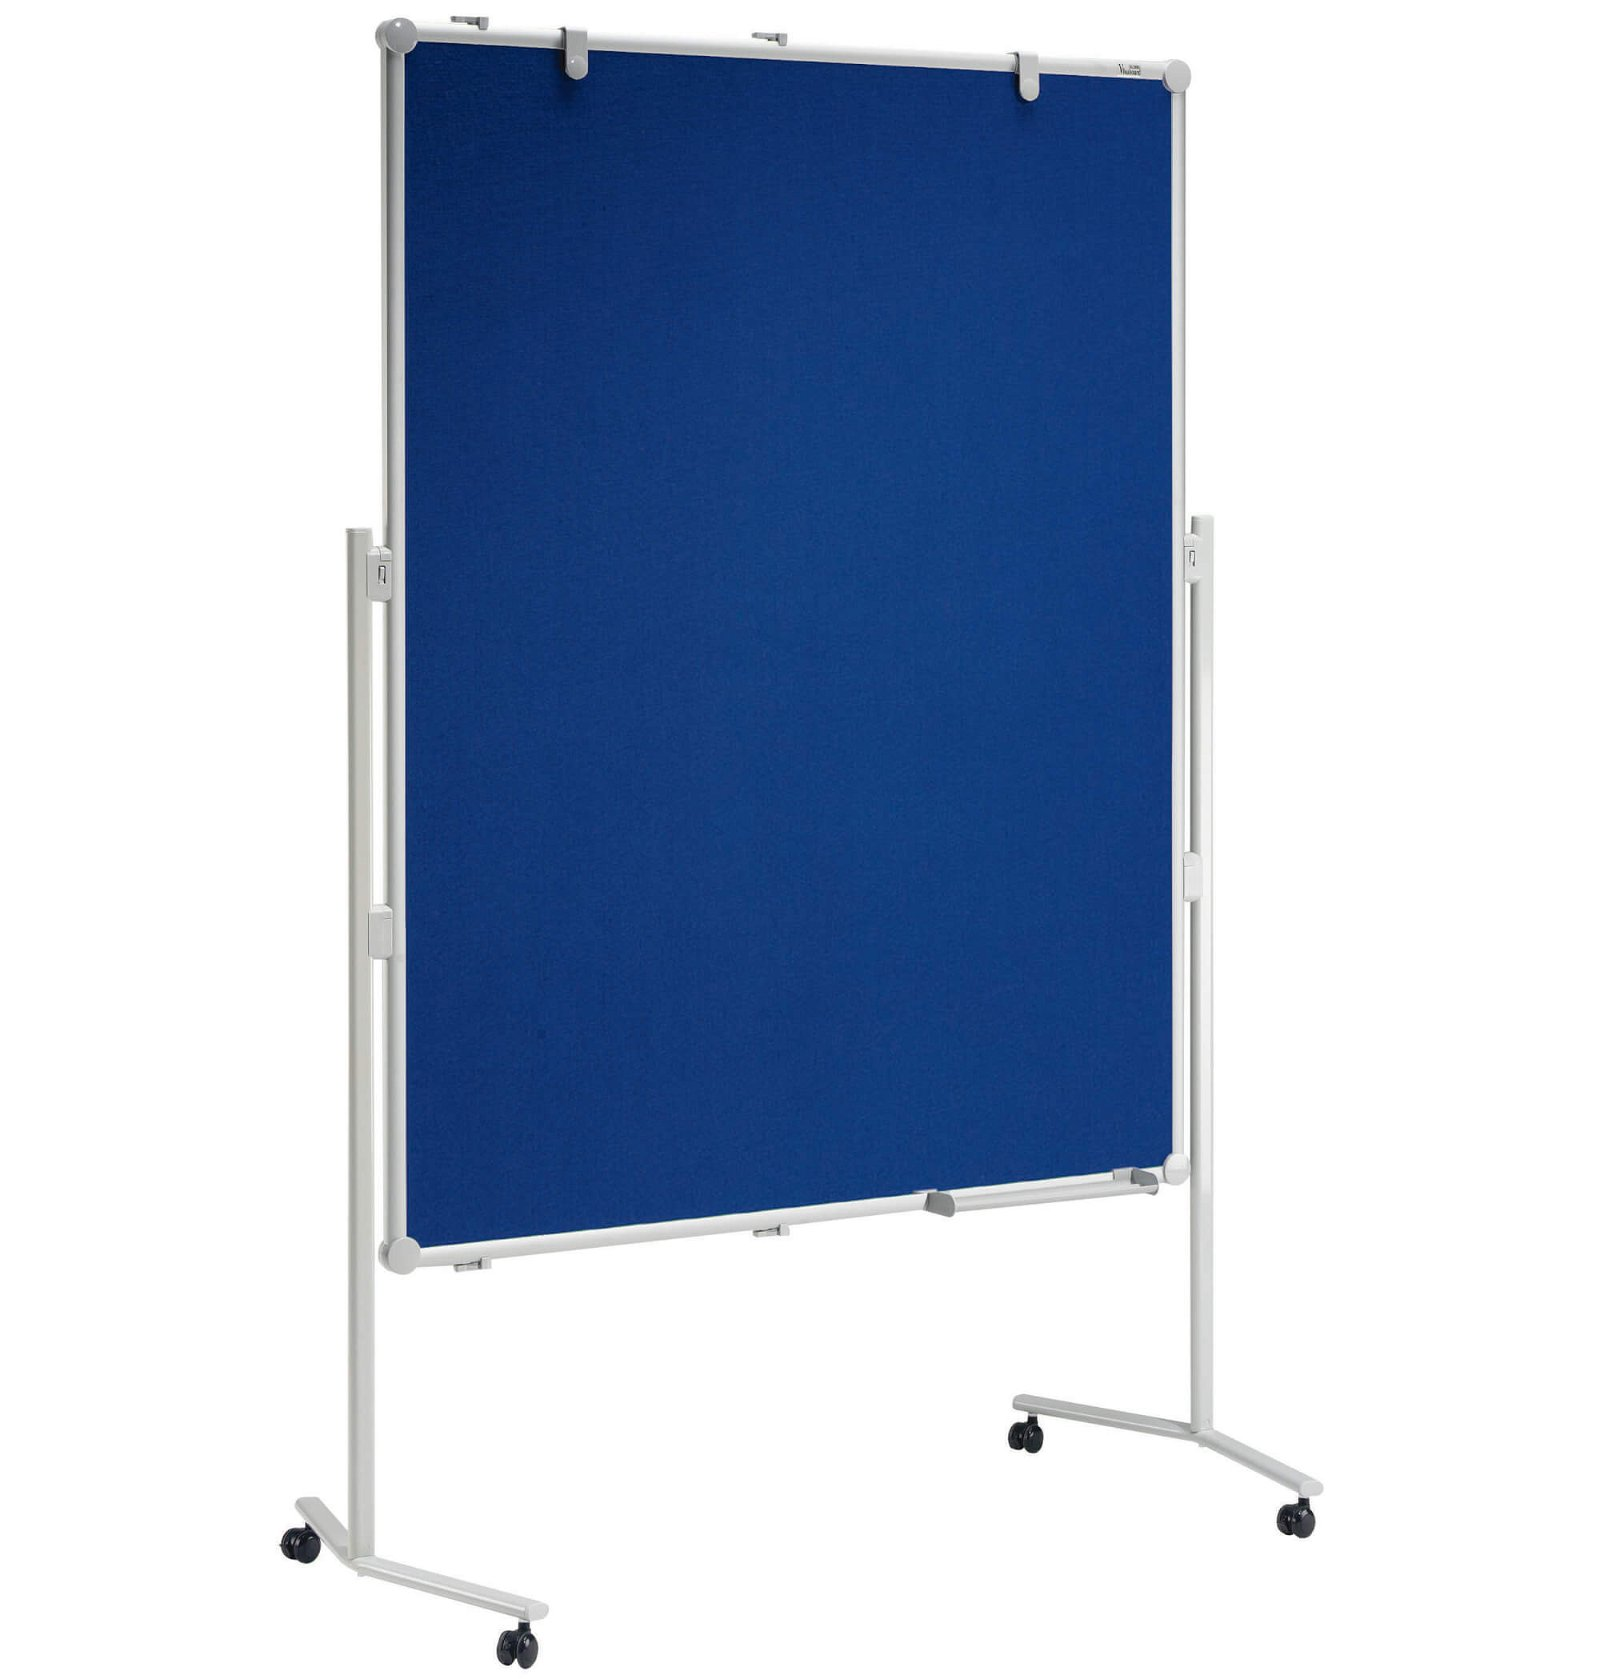 Moderationstafel MAULpro Textil blau, 150x120 cm, grau